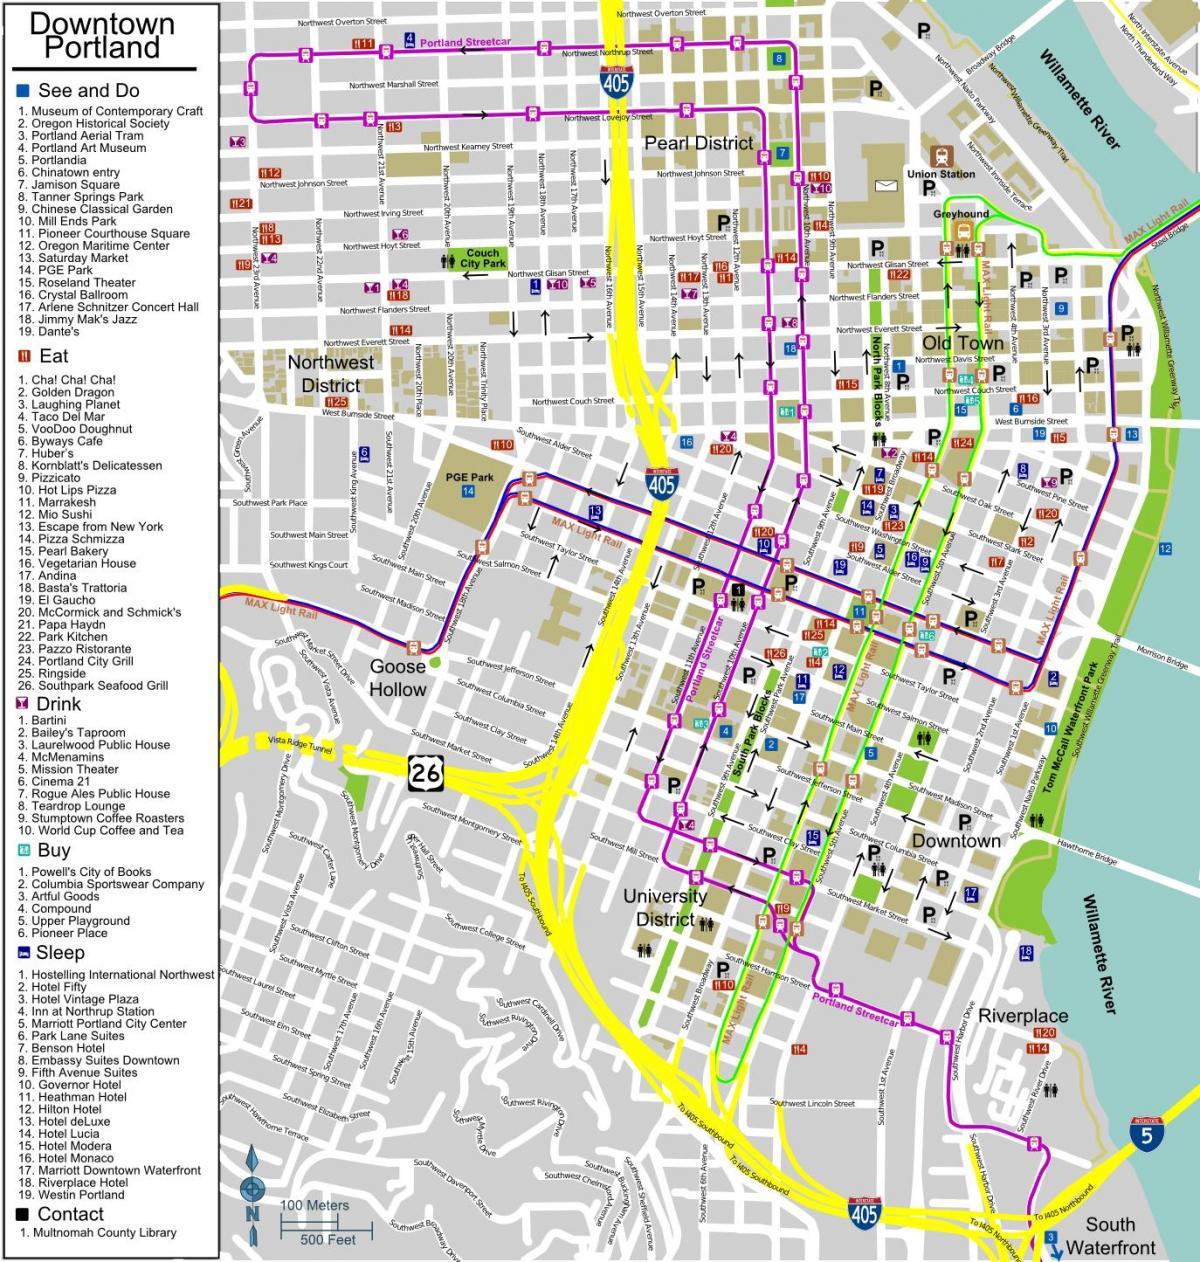 Portland Oregon street map - Portland or street map (Oregon - USA)